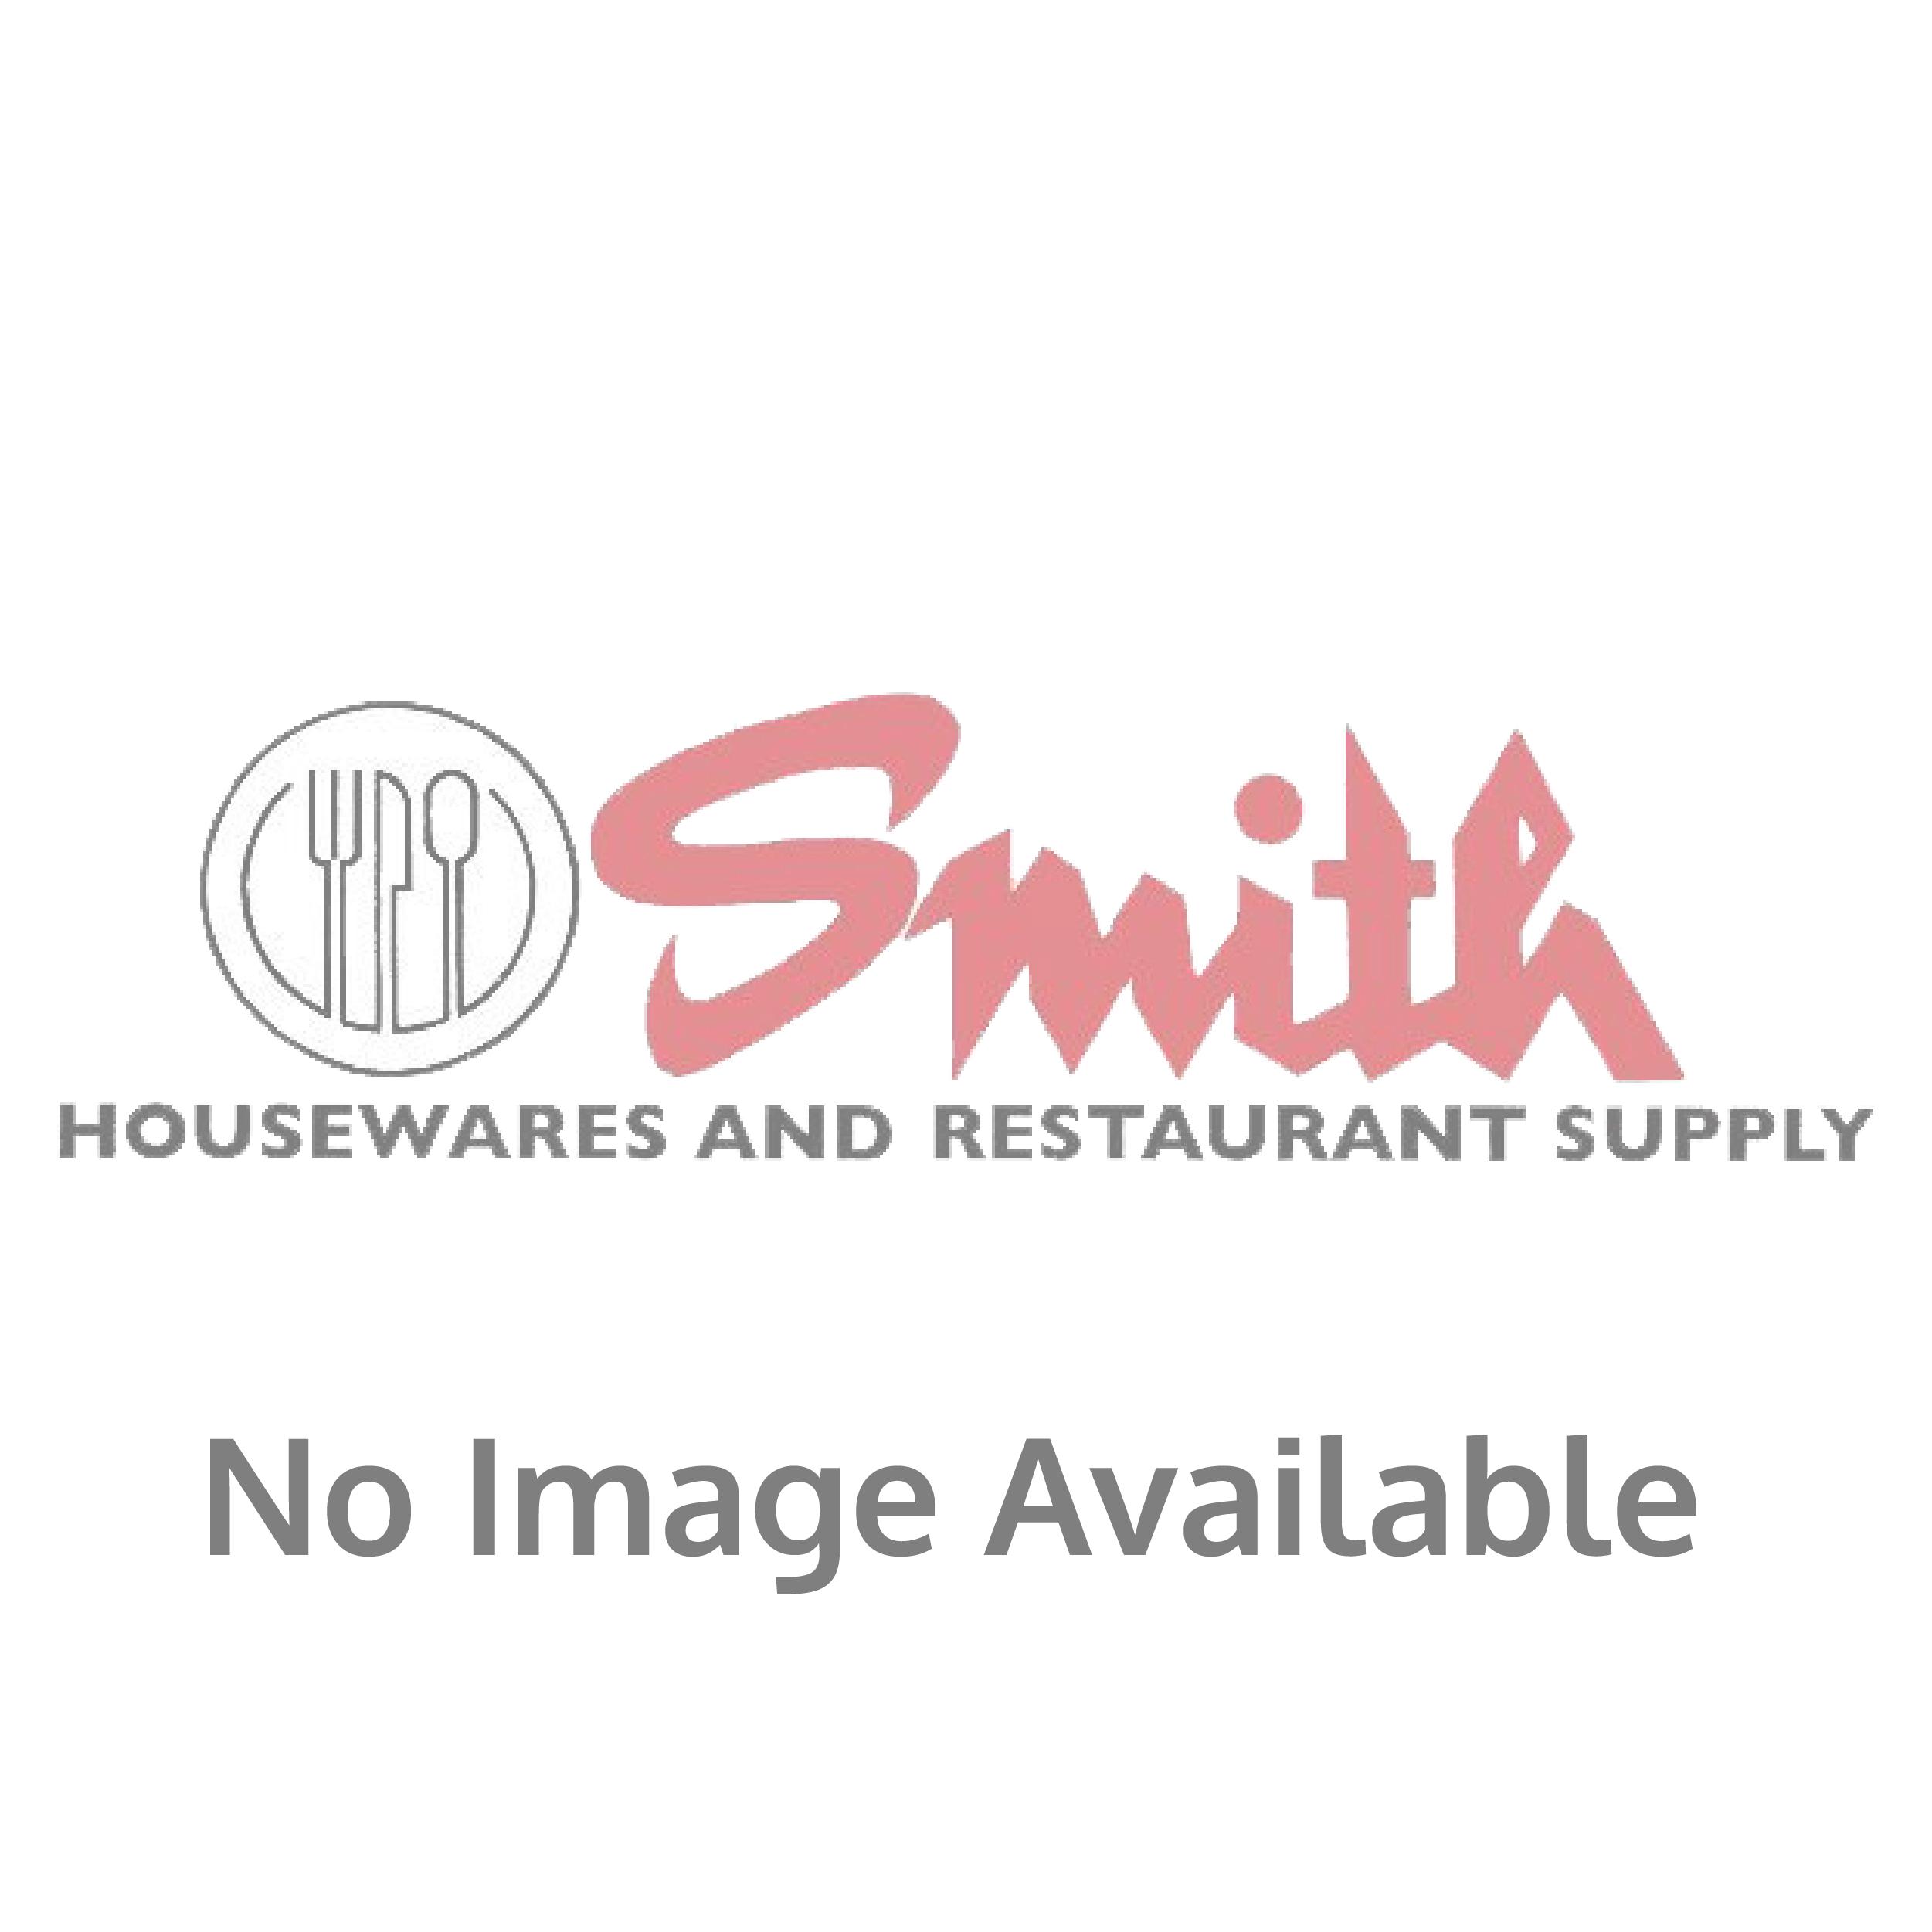 Champagne Flute glass, 6.25 oz, 1dz/case